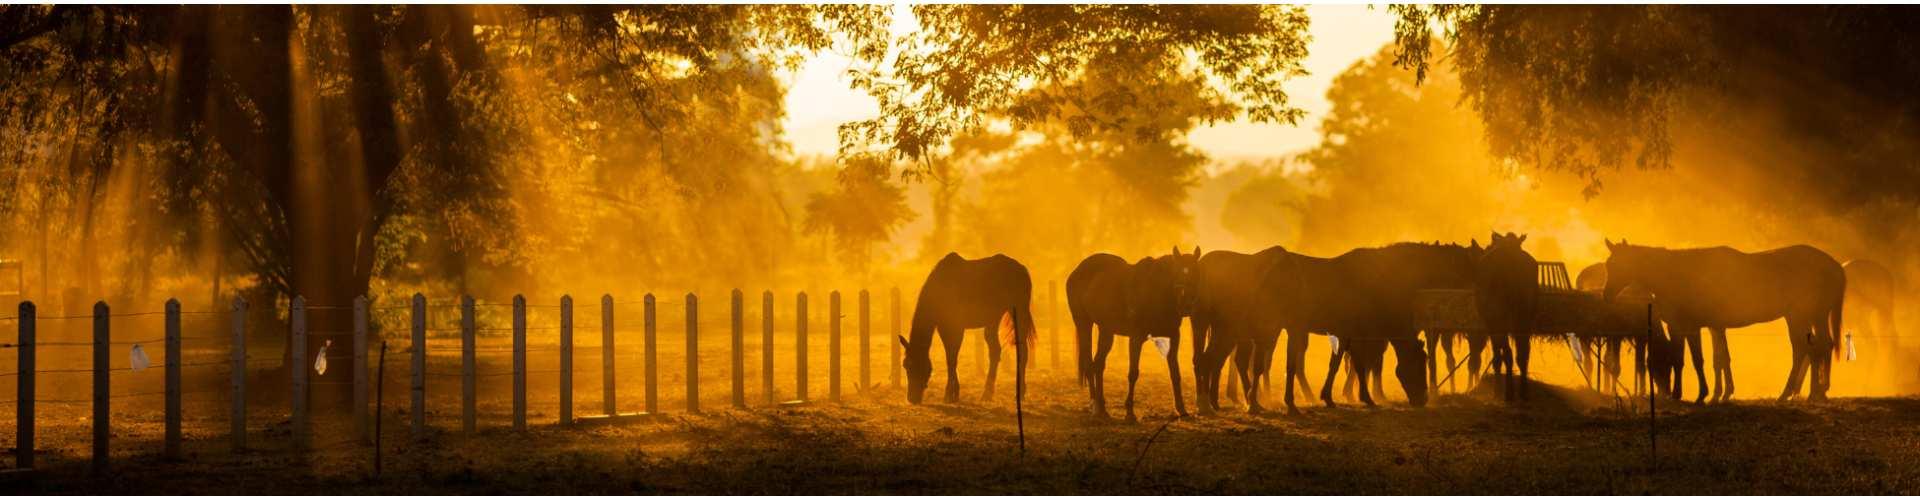 Equine online plarform